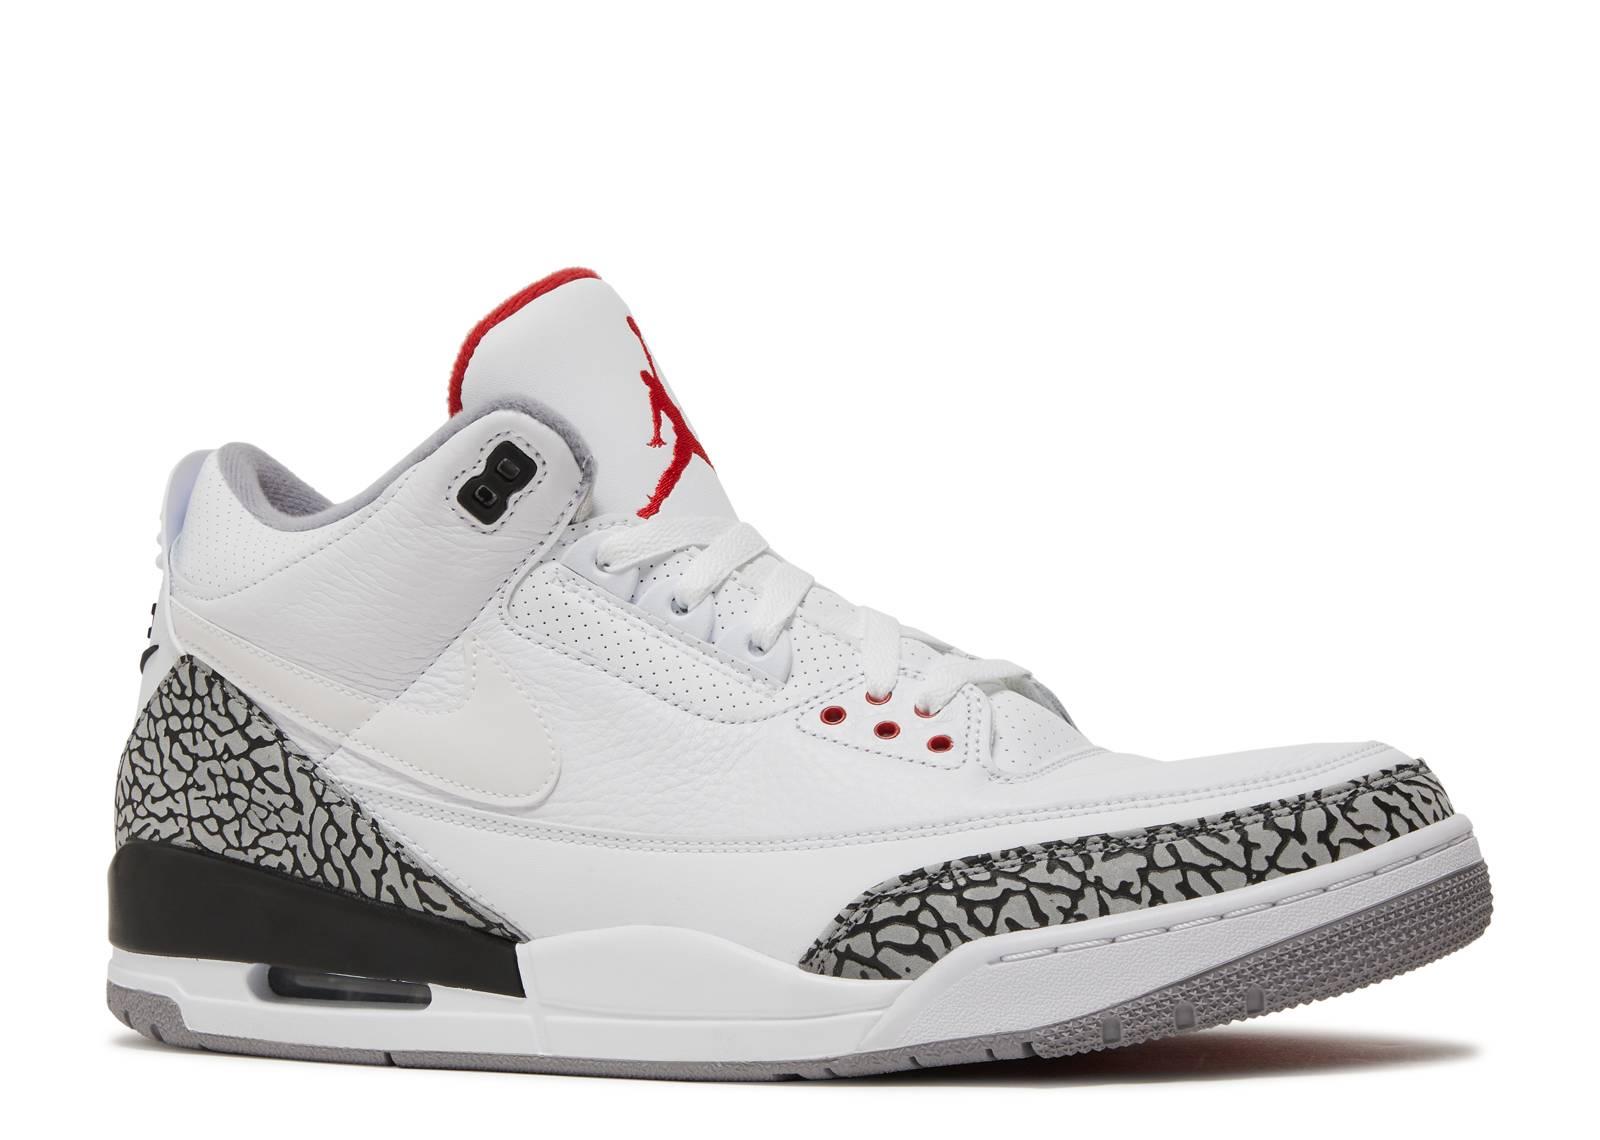 Air Jordan 3 Retro JTH NRG 'White Cement'